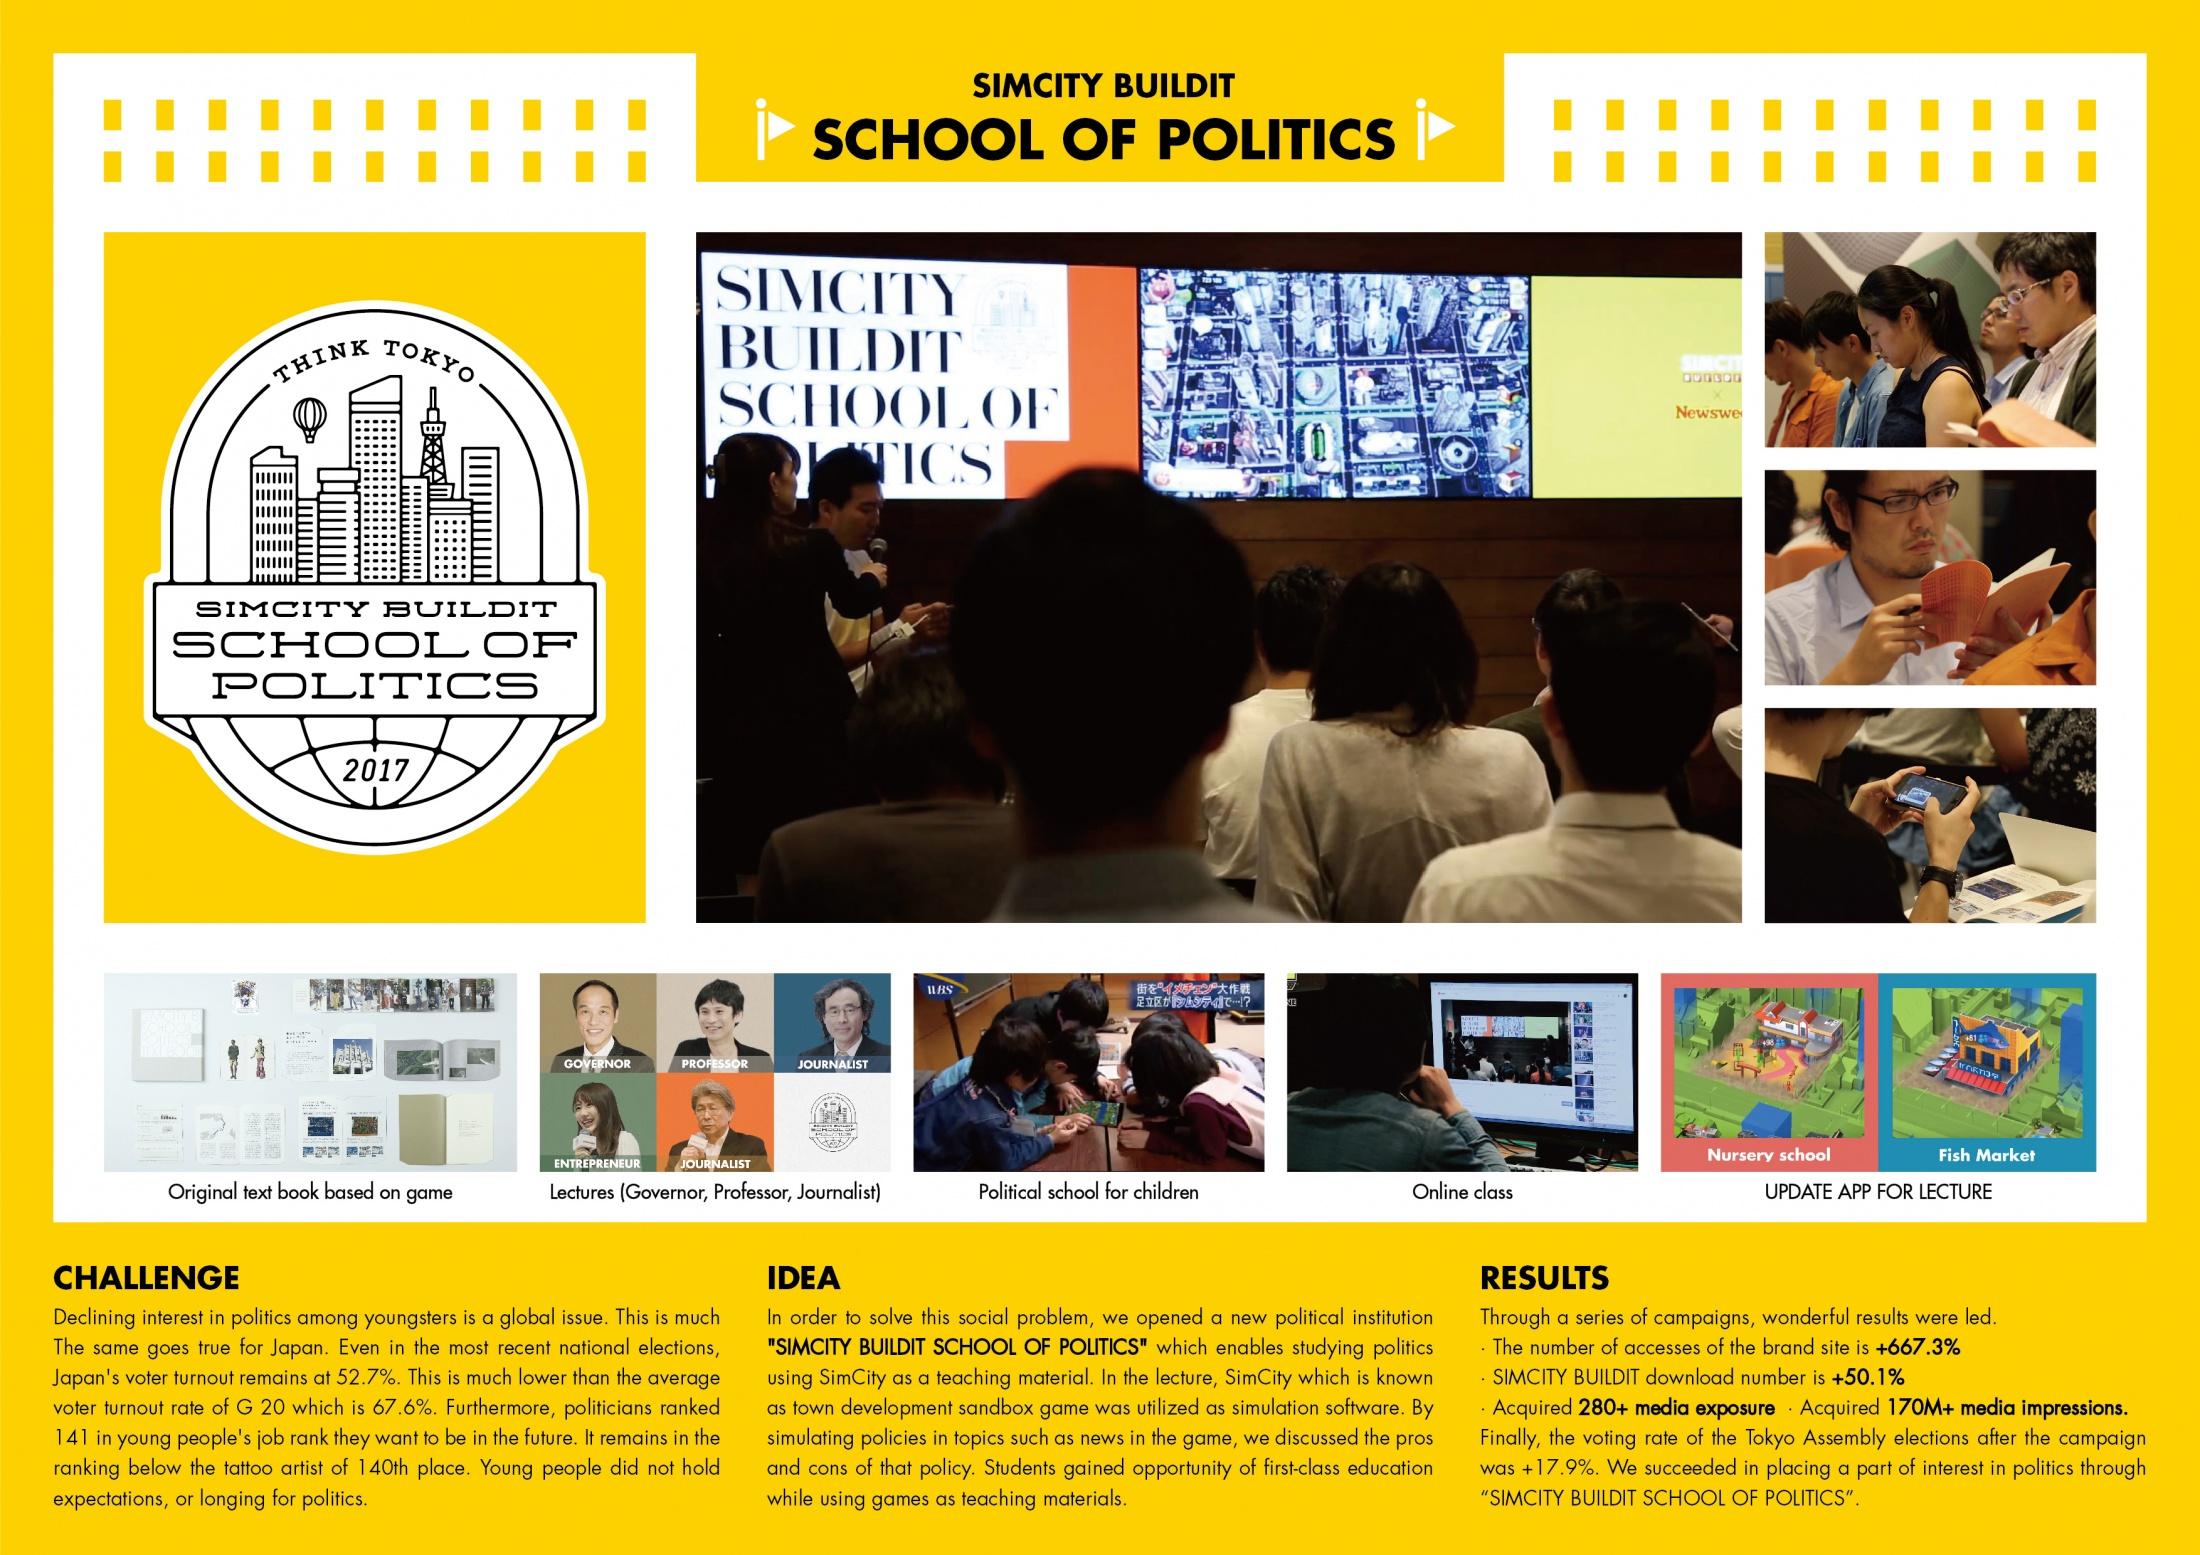 Thumbnail for Simcity Buildit School of Politics